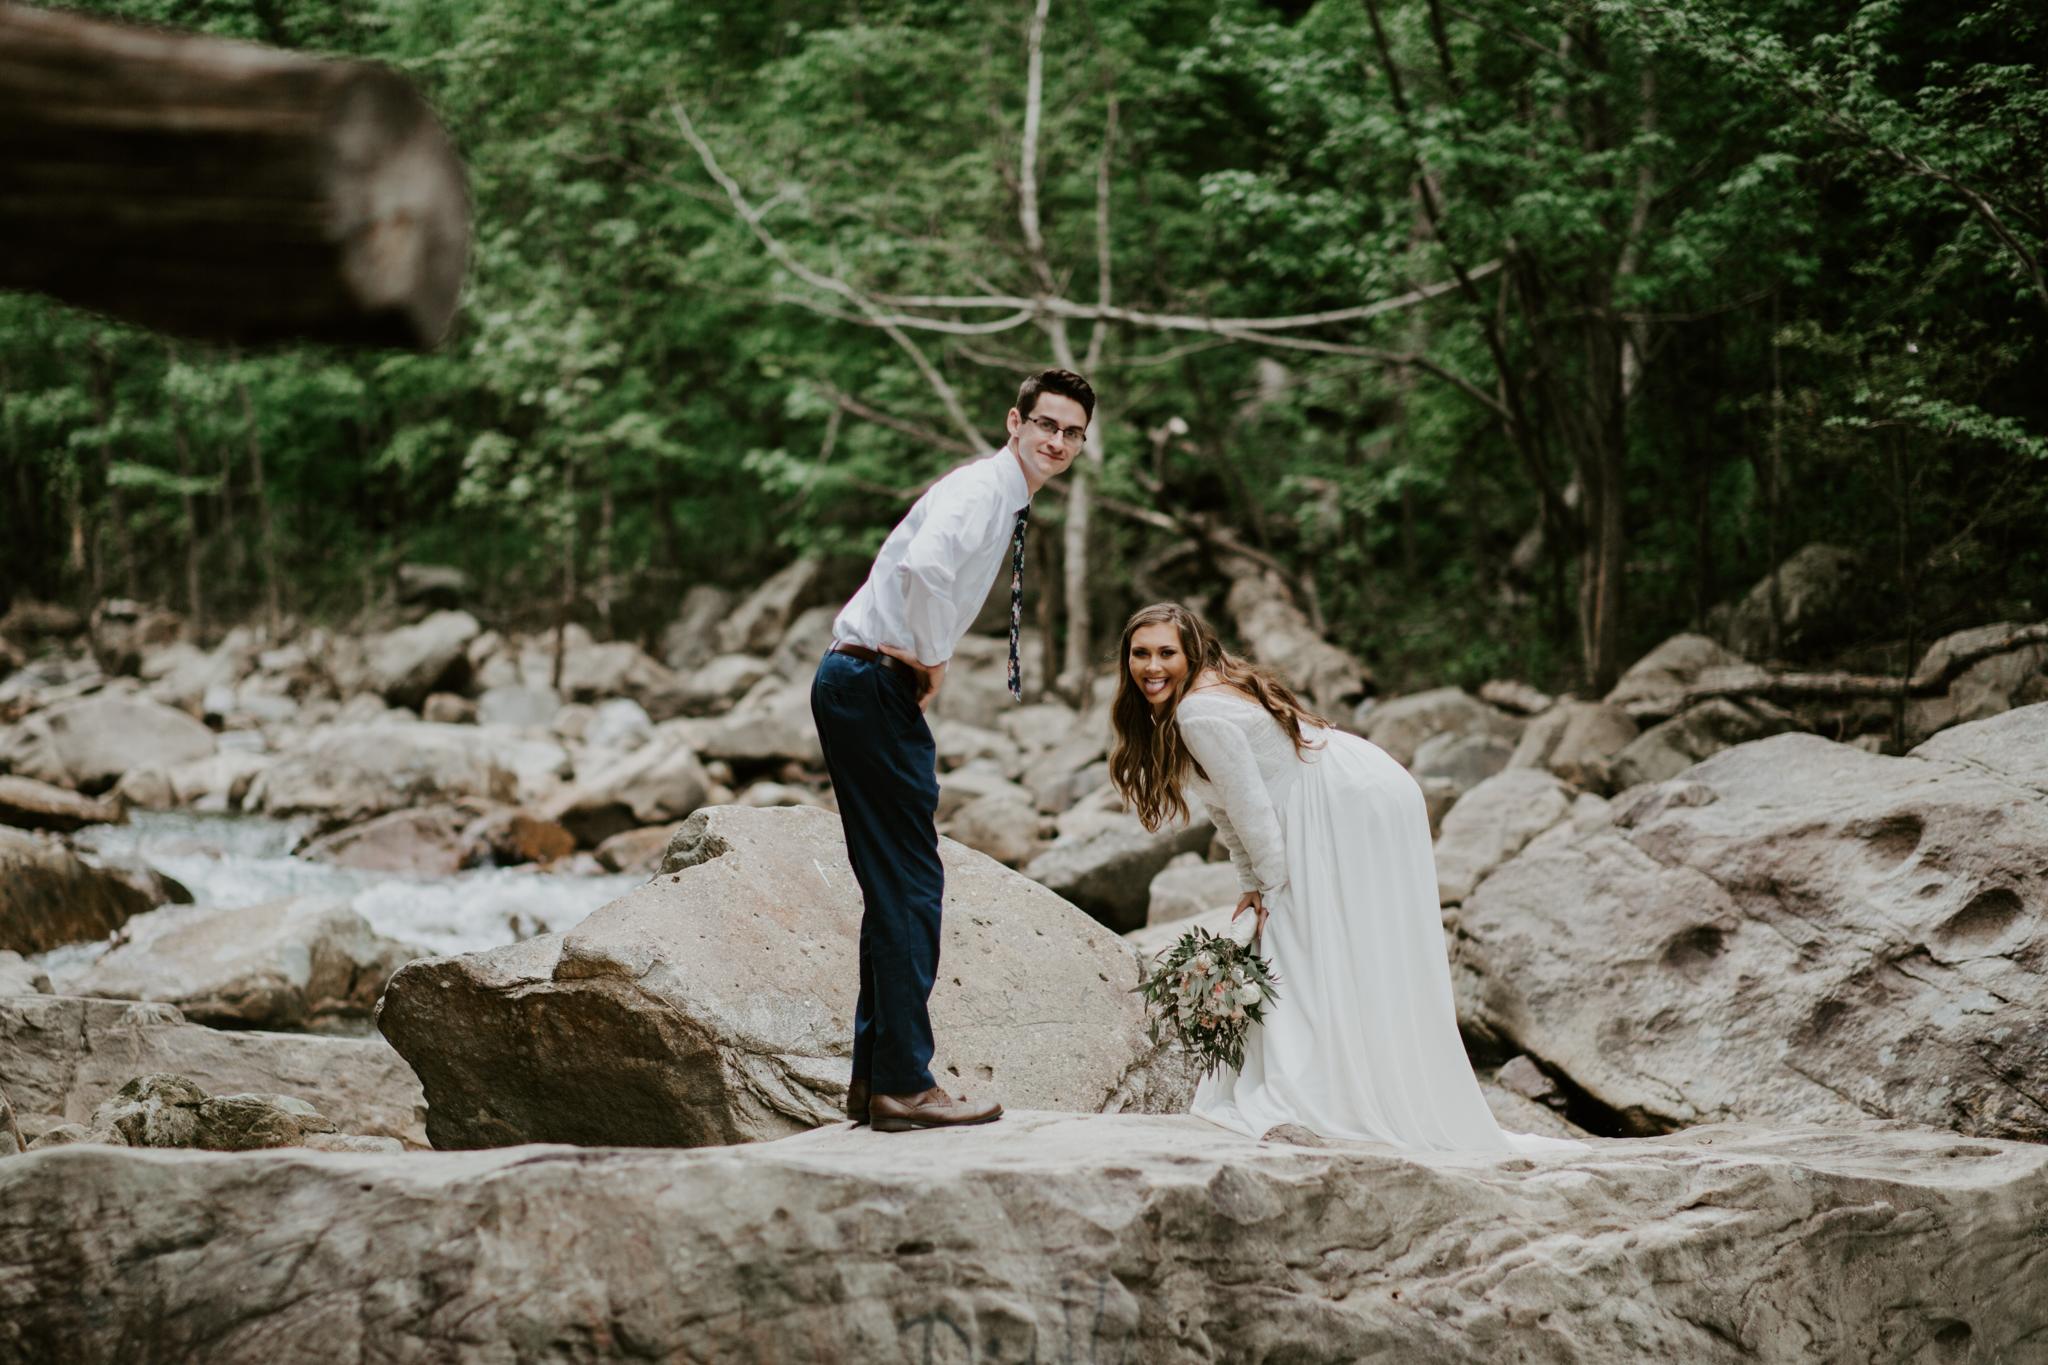 Lacey-Joe-Chattanooga-Nashville-Tennessee-Wedding-Elopement-Photographer-211.jpg